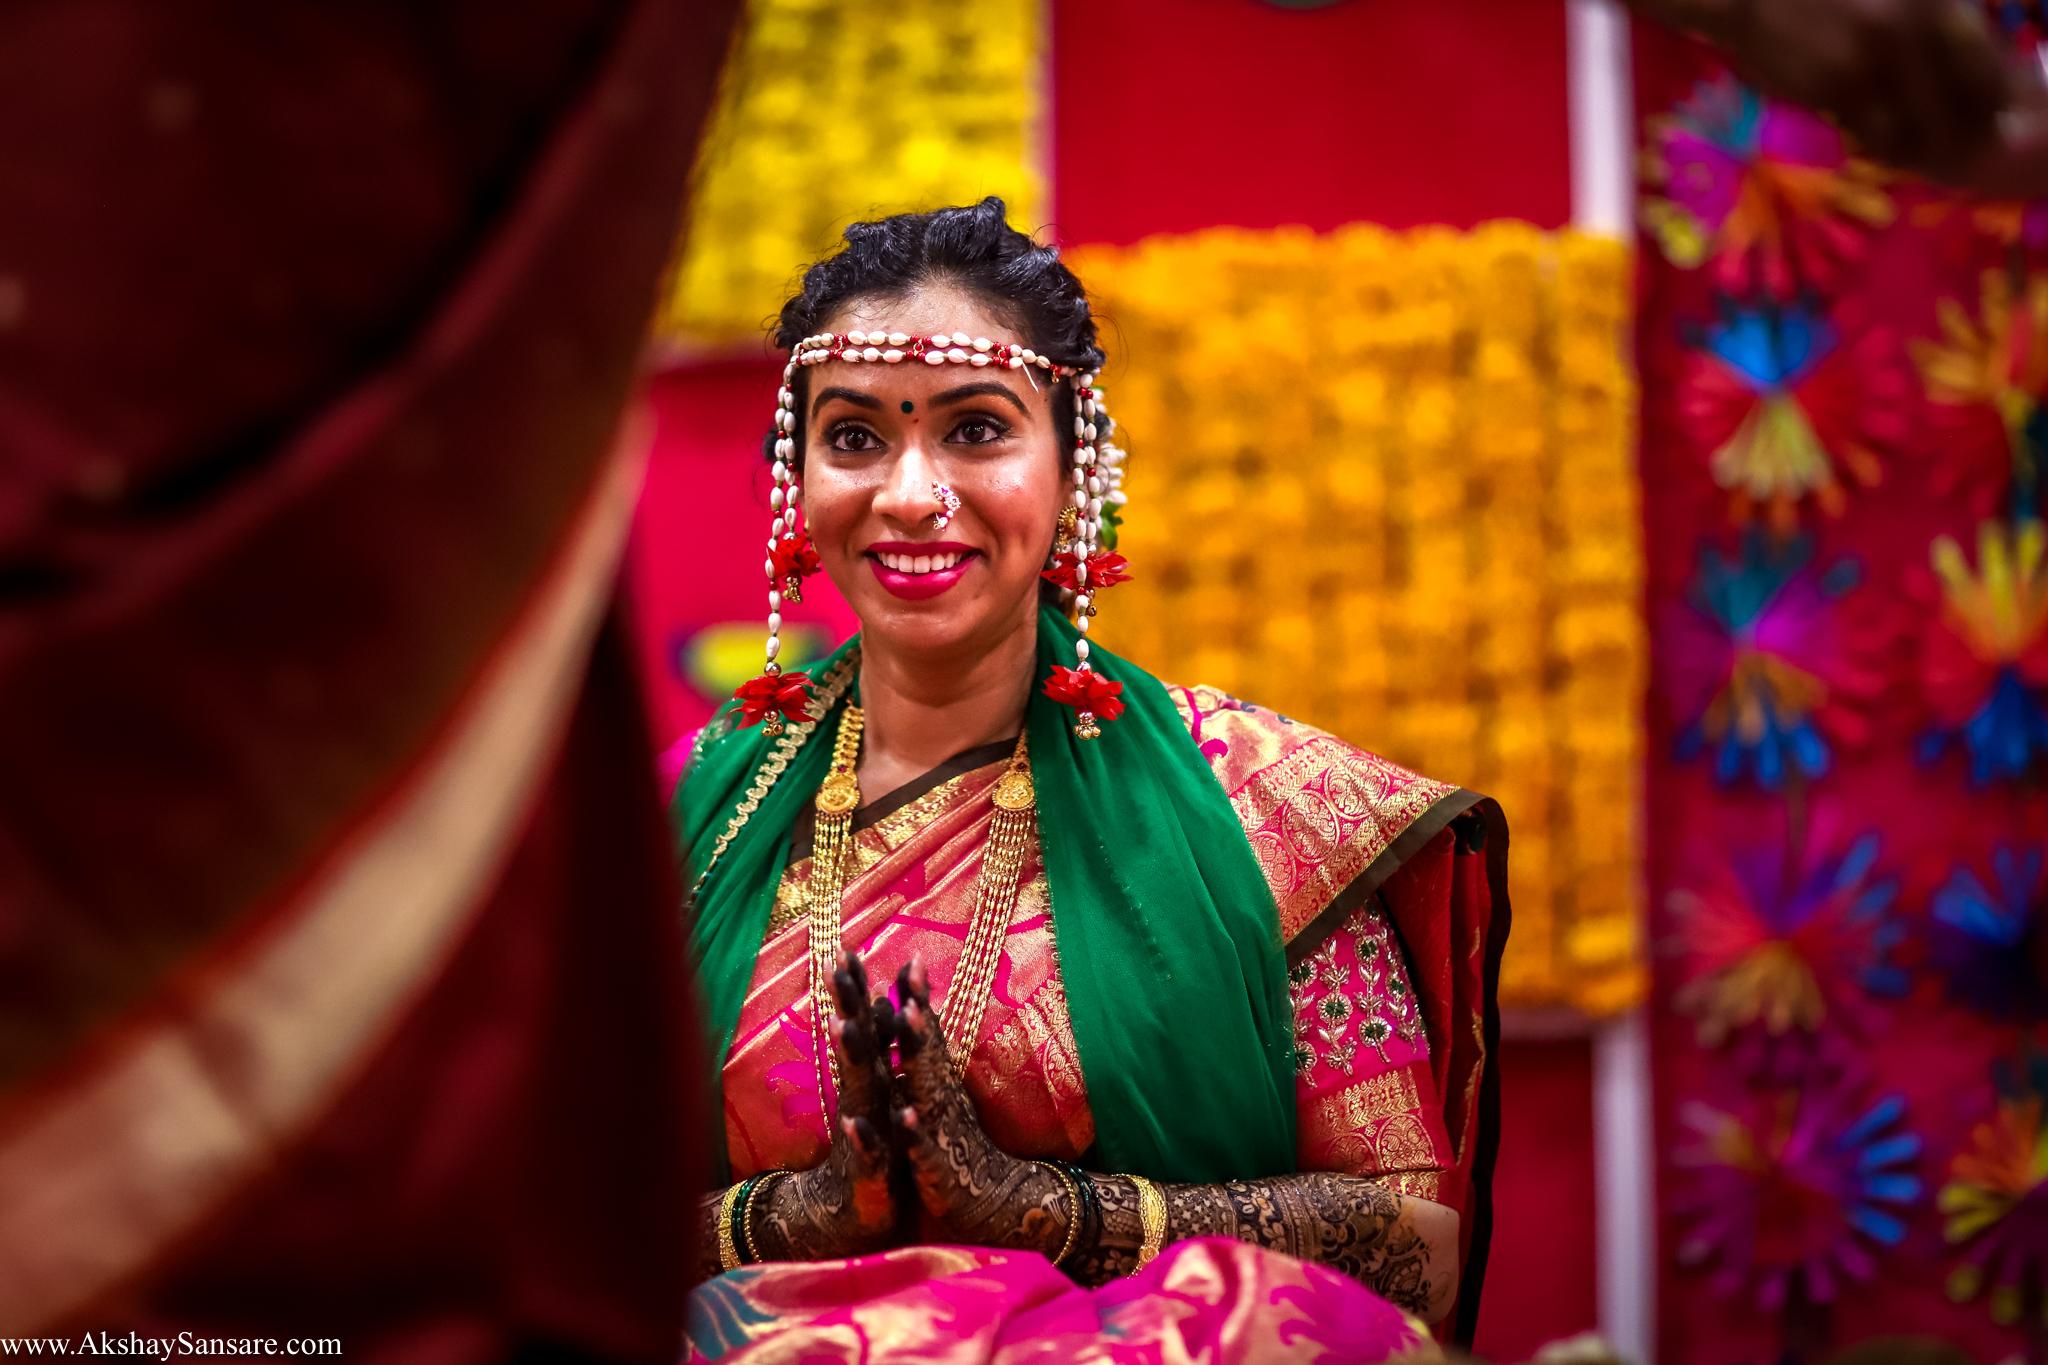 Nupur & Rohan wedding Akshay Sansare Photography best wedding photographer in mumbai India Candid(27).jpg